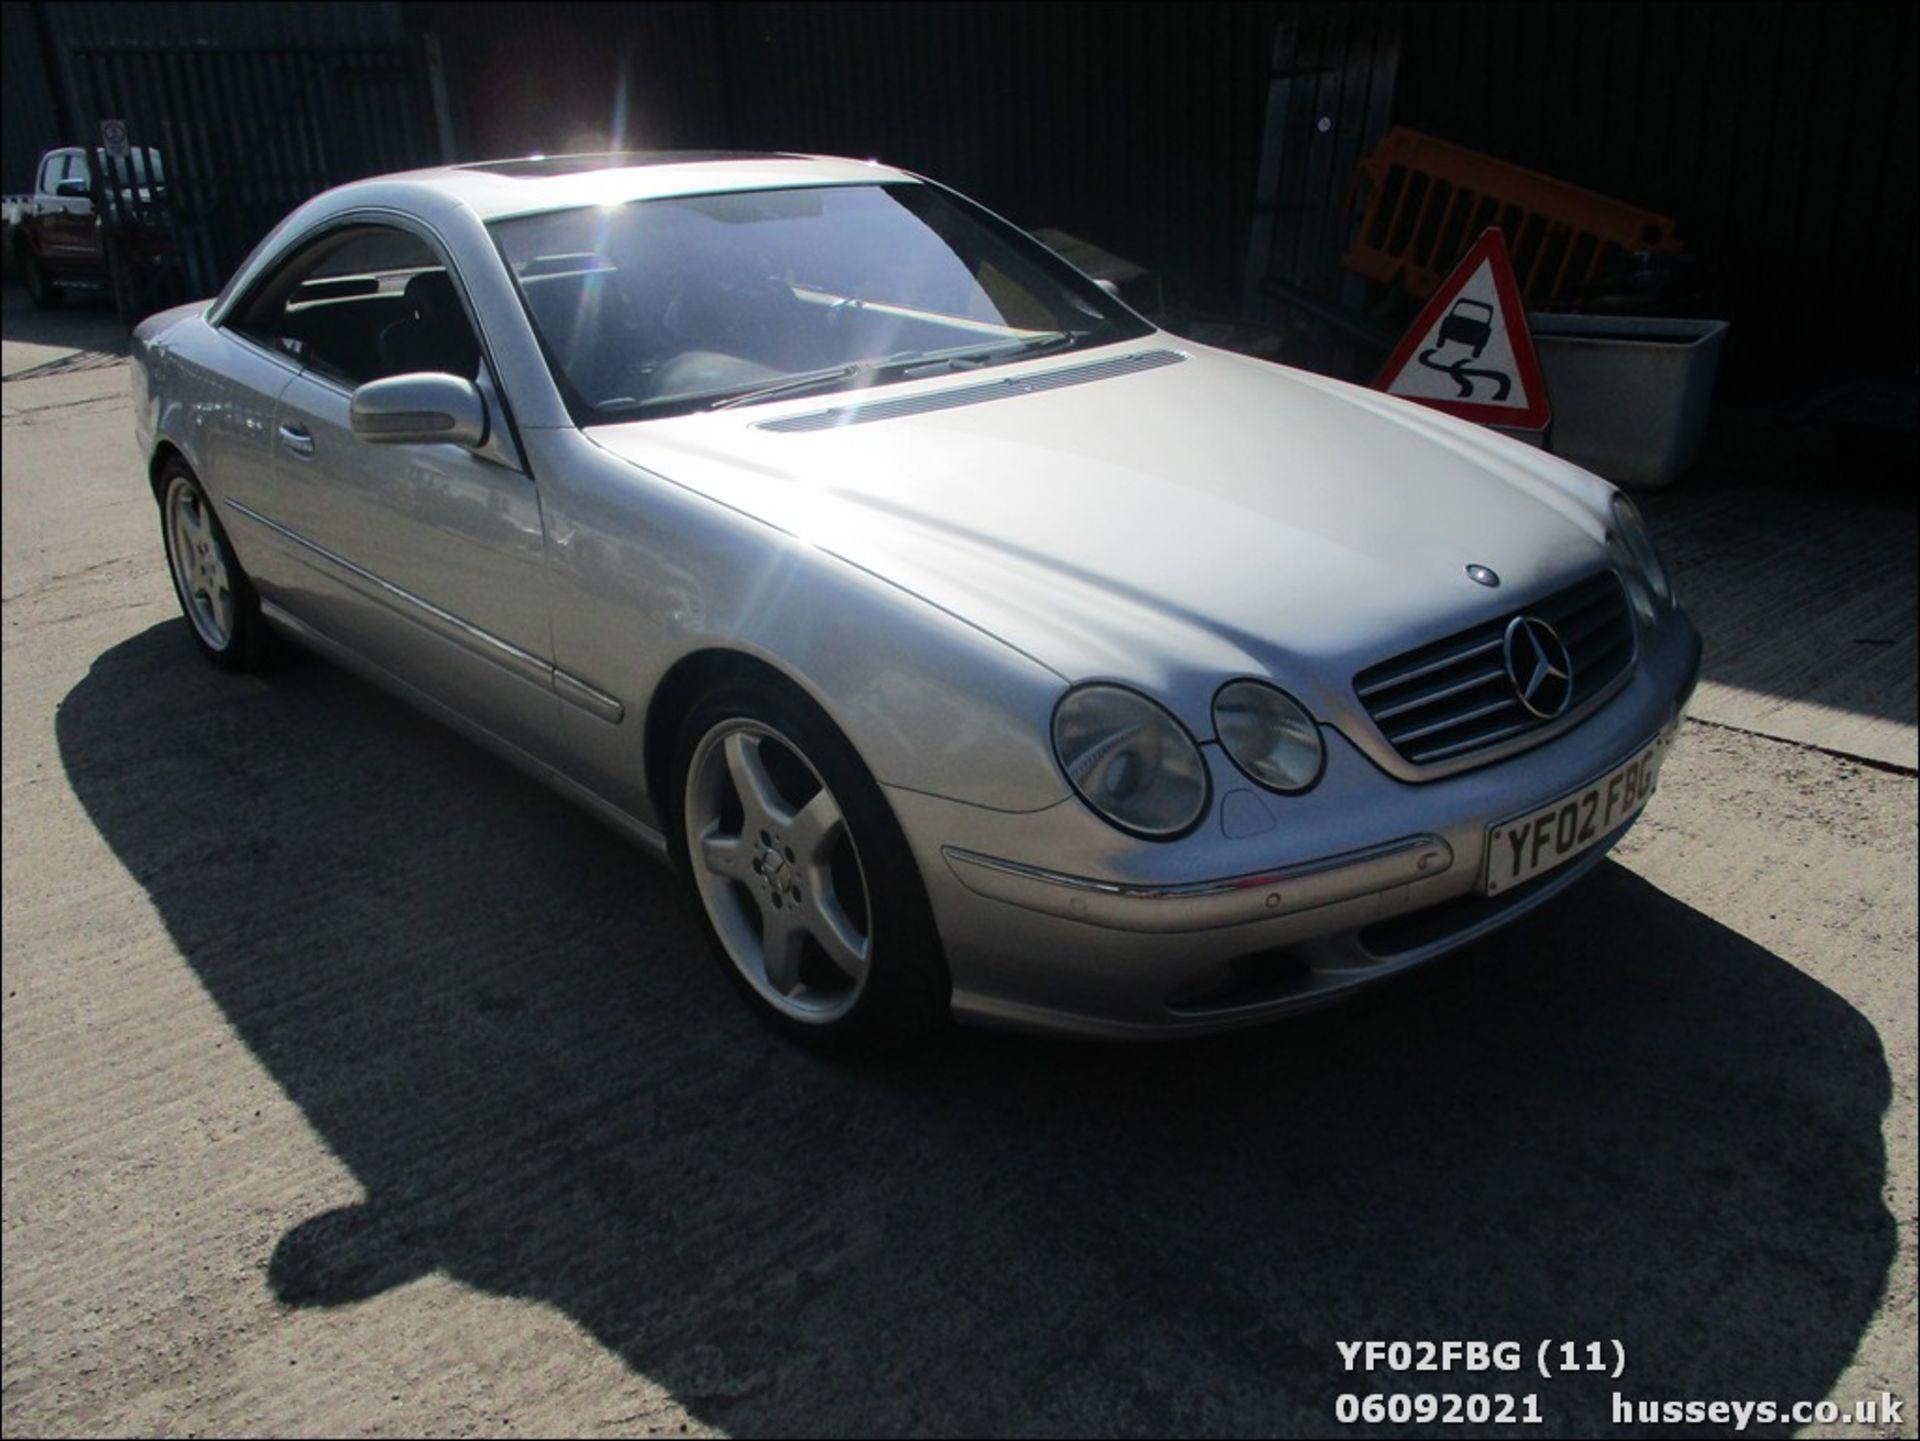 02/02 MERCEDES CL500 AUTO - 4966cc 2dr Coupe (Silver, 64k) - Image 11 of 16